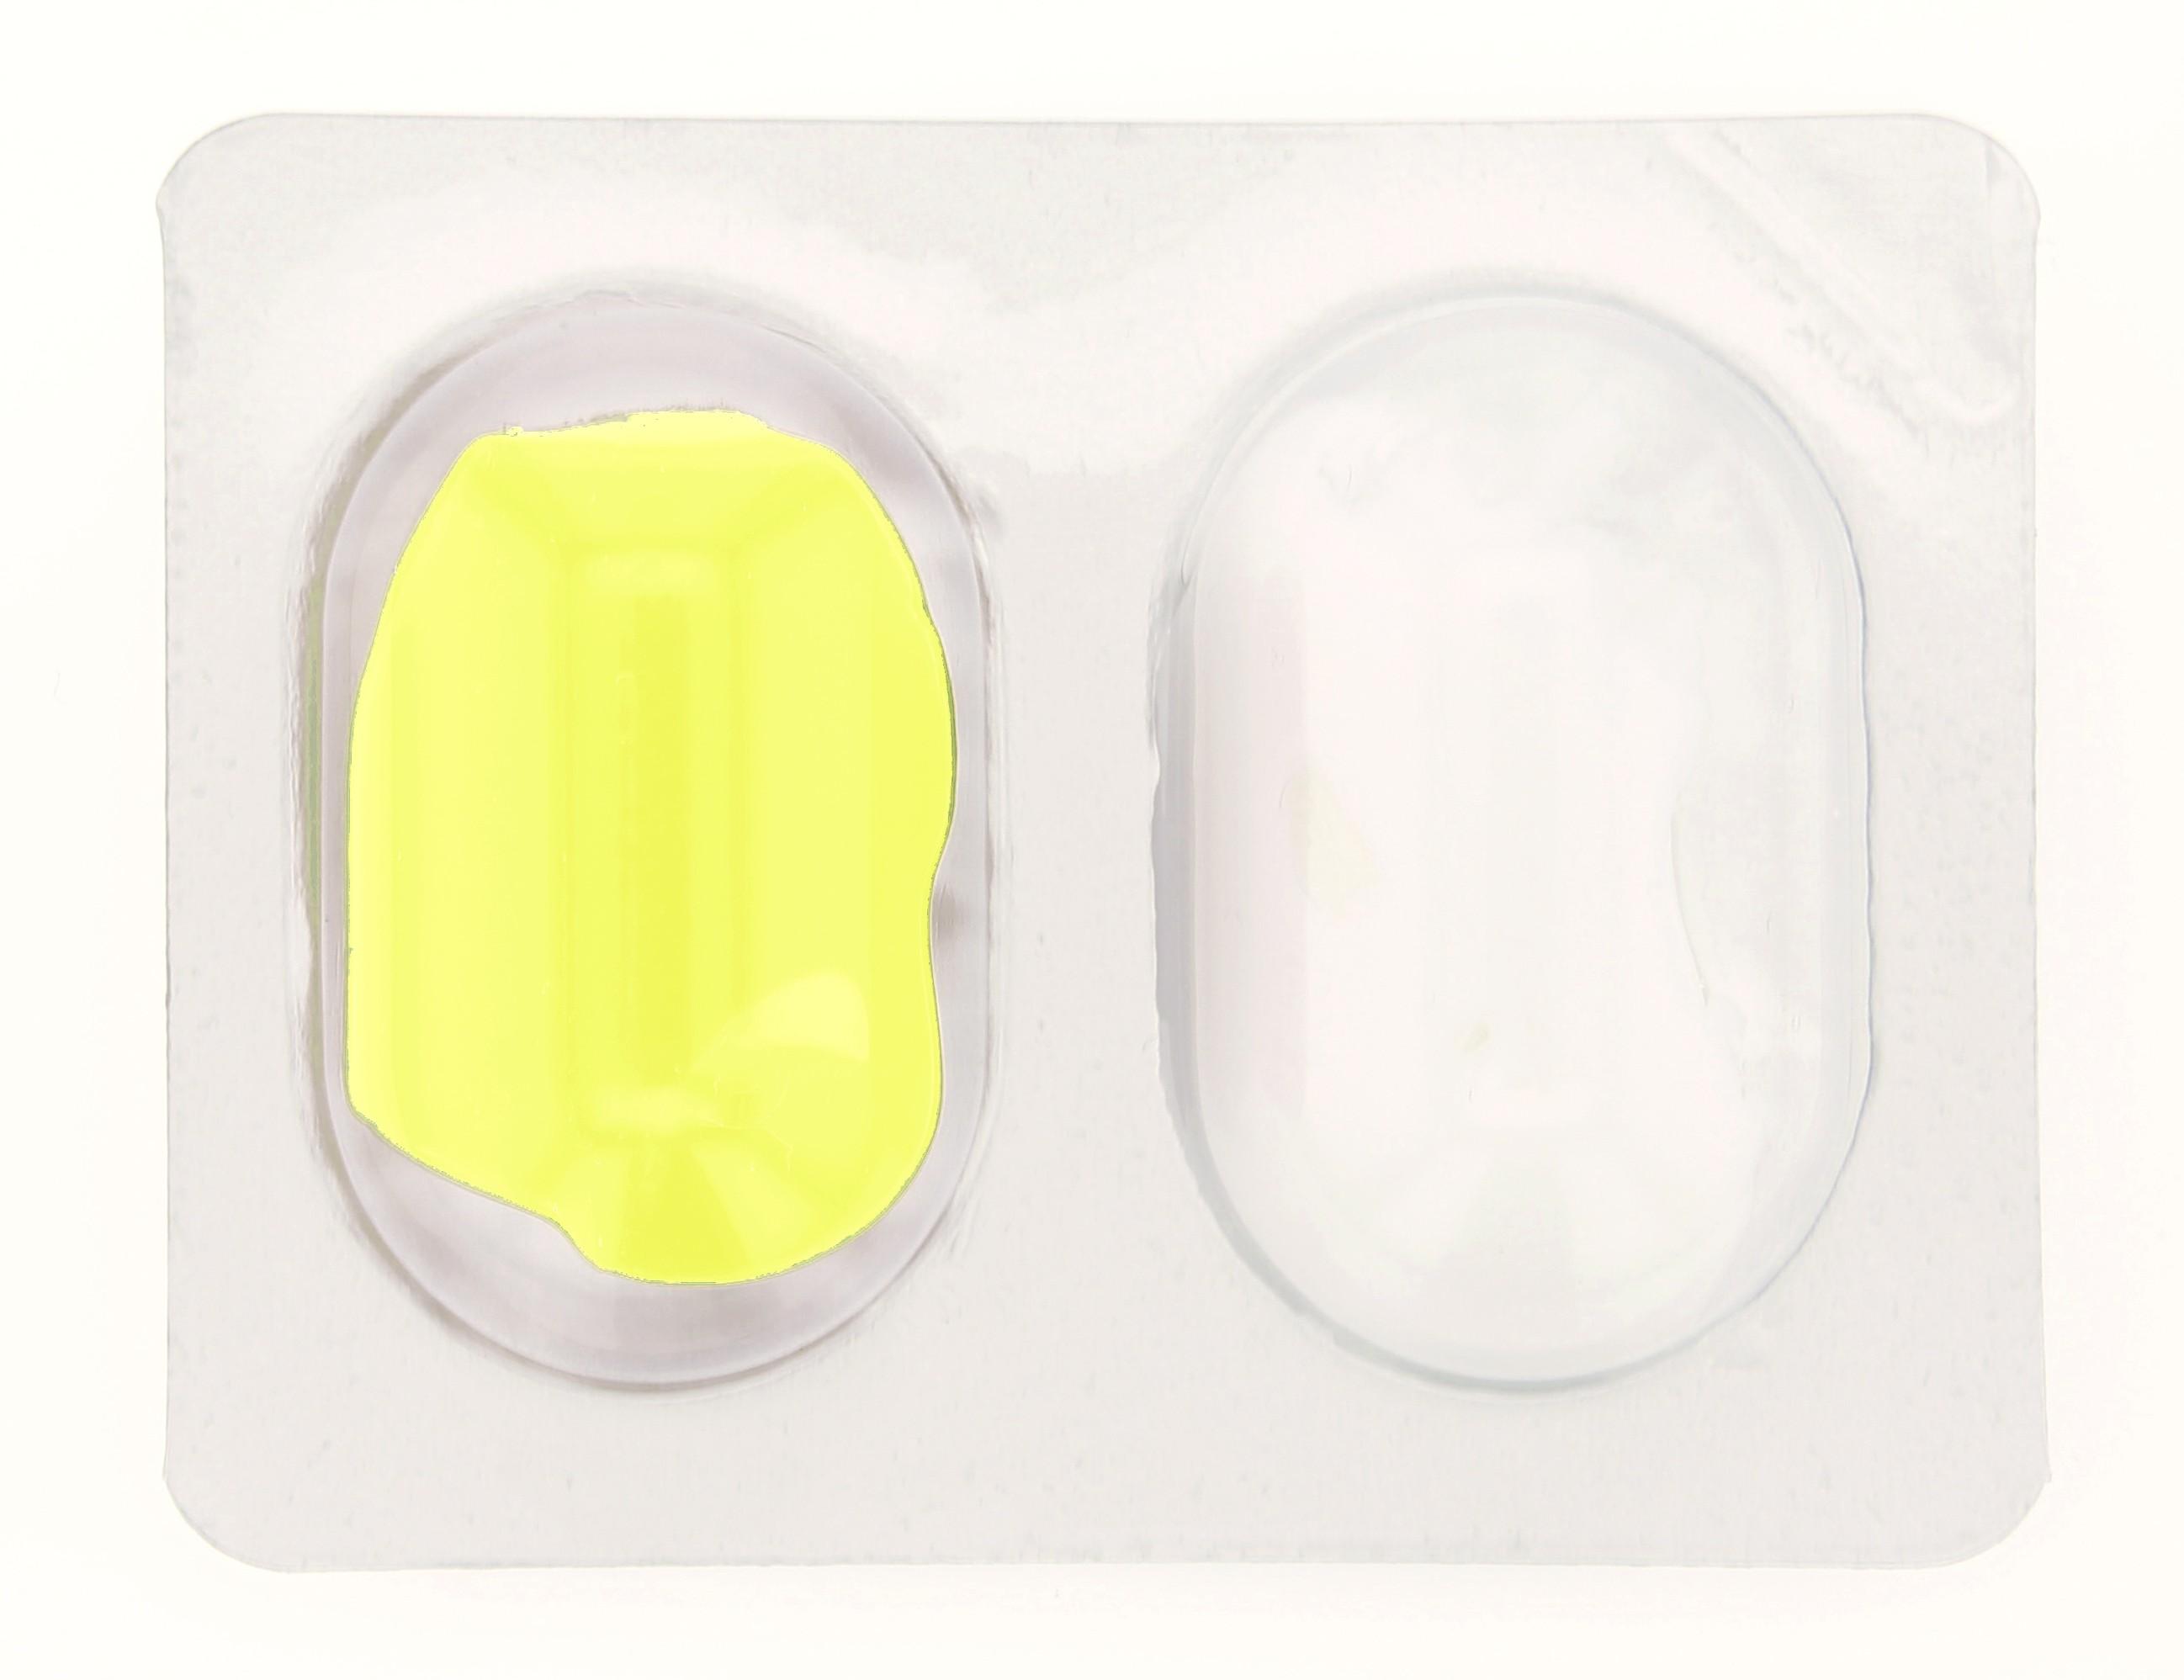 EZ Mold Singles Set - Yellow